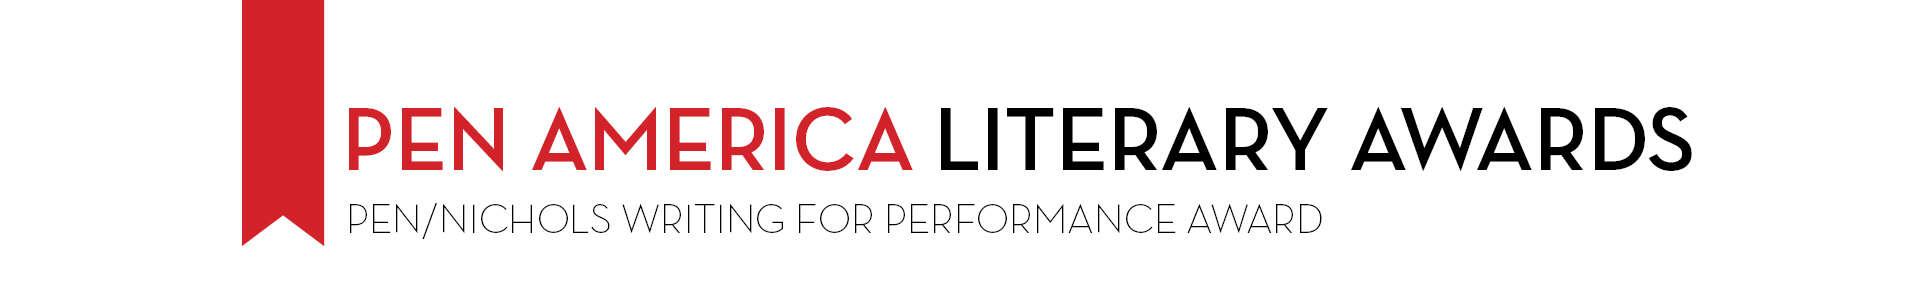 PEN America Literary Awards PEN/Nichols Writing for Performance Award